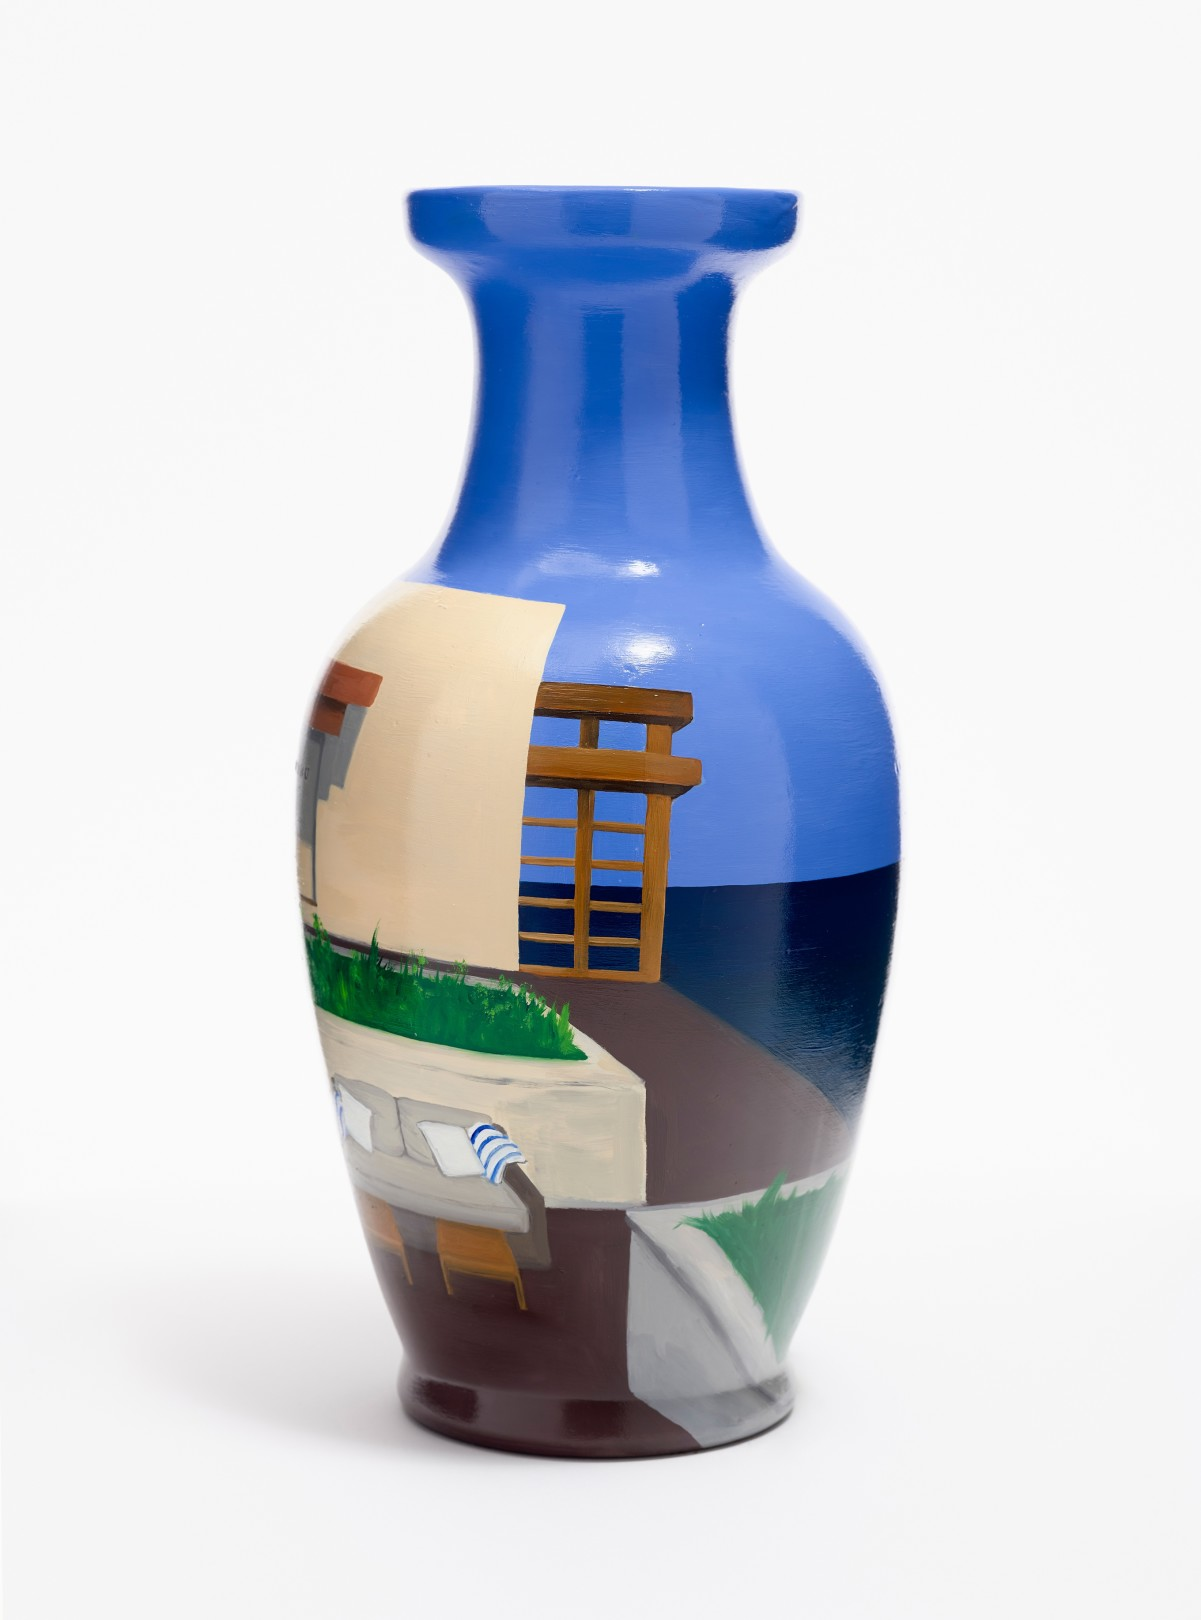 Nobu, Malibu, 2021 Oil on ceramic Height: 36, Base: 12 cm. / Height: 14. 1, Base: 4.7 in.